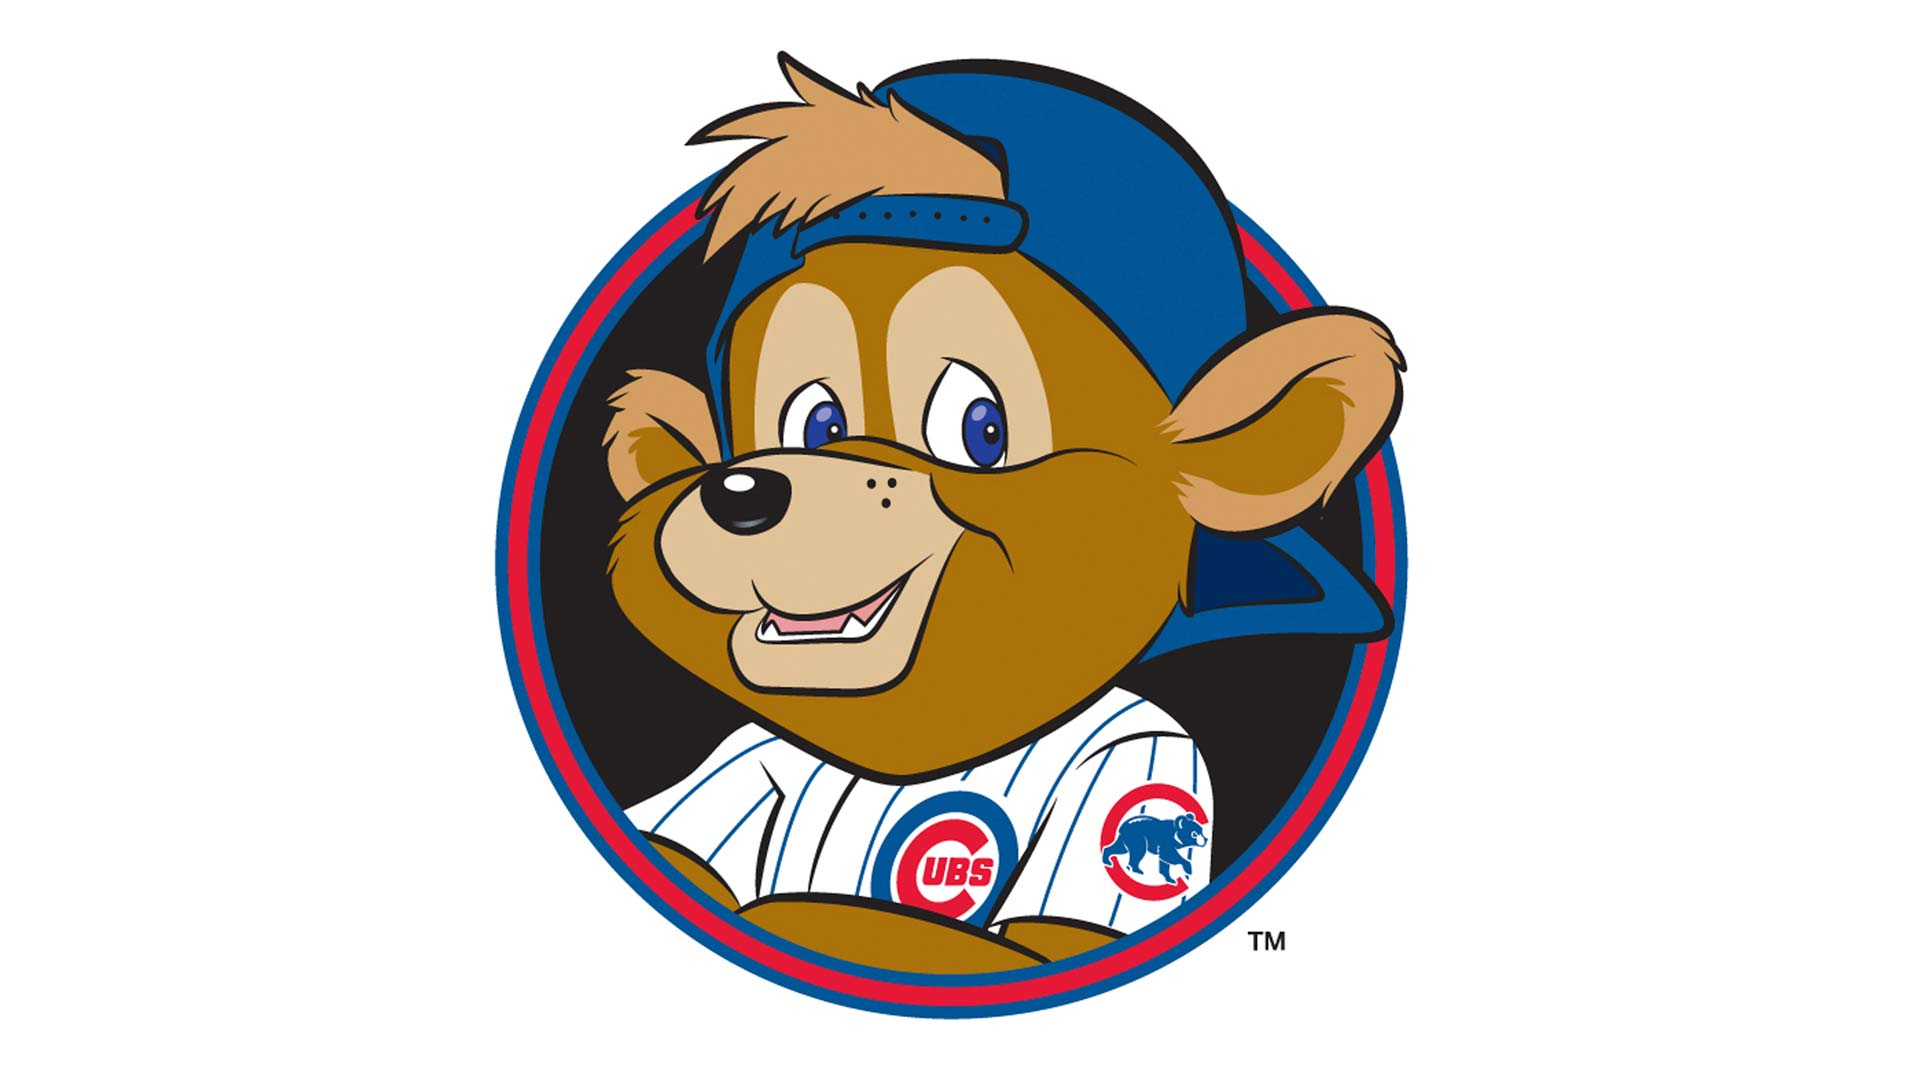 Cubs-Mascot-011714-FTR-AP.jpg